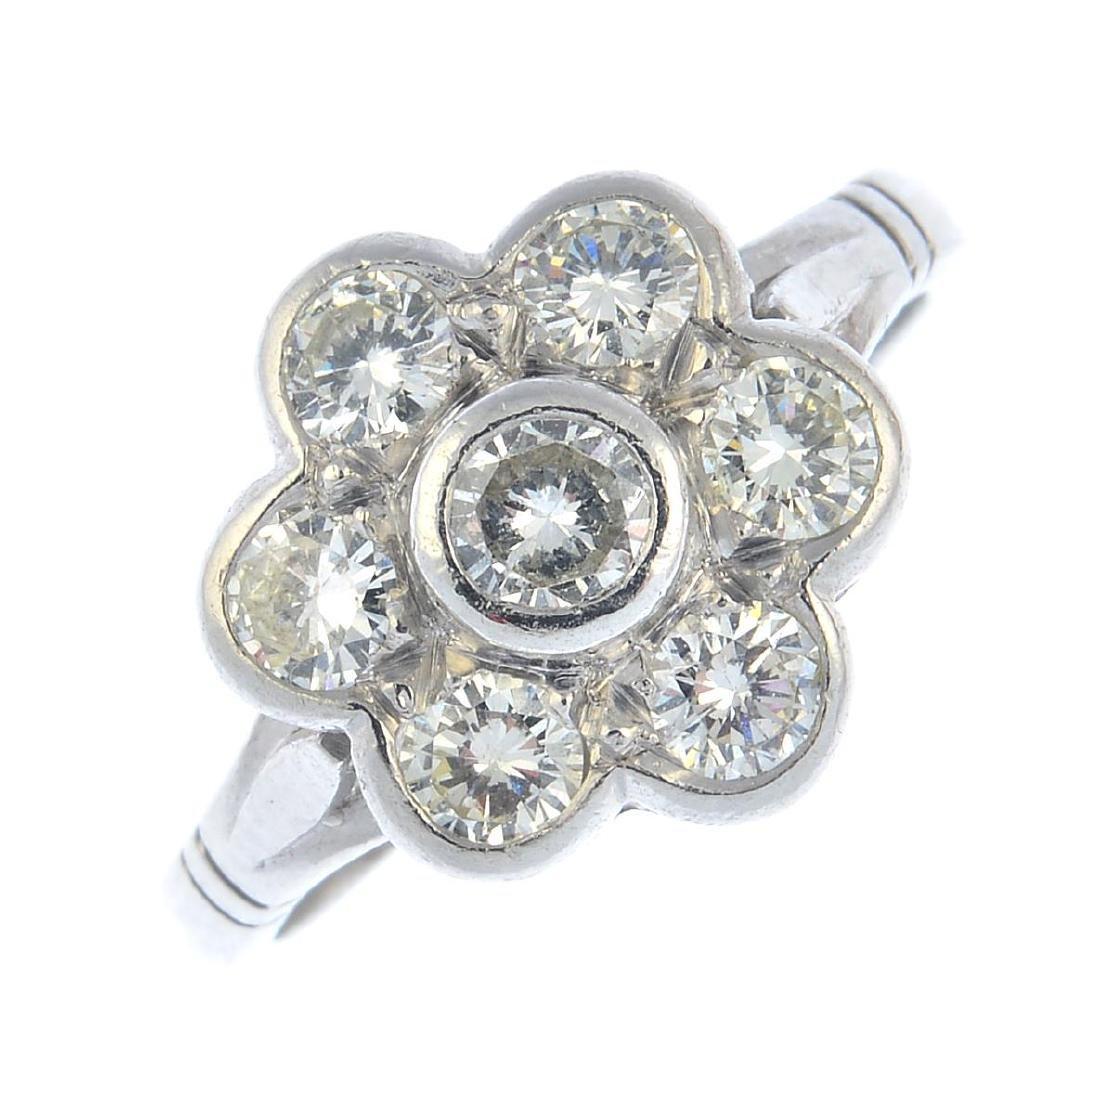 A platinum diamond cluster ring. The brilliant-cut